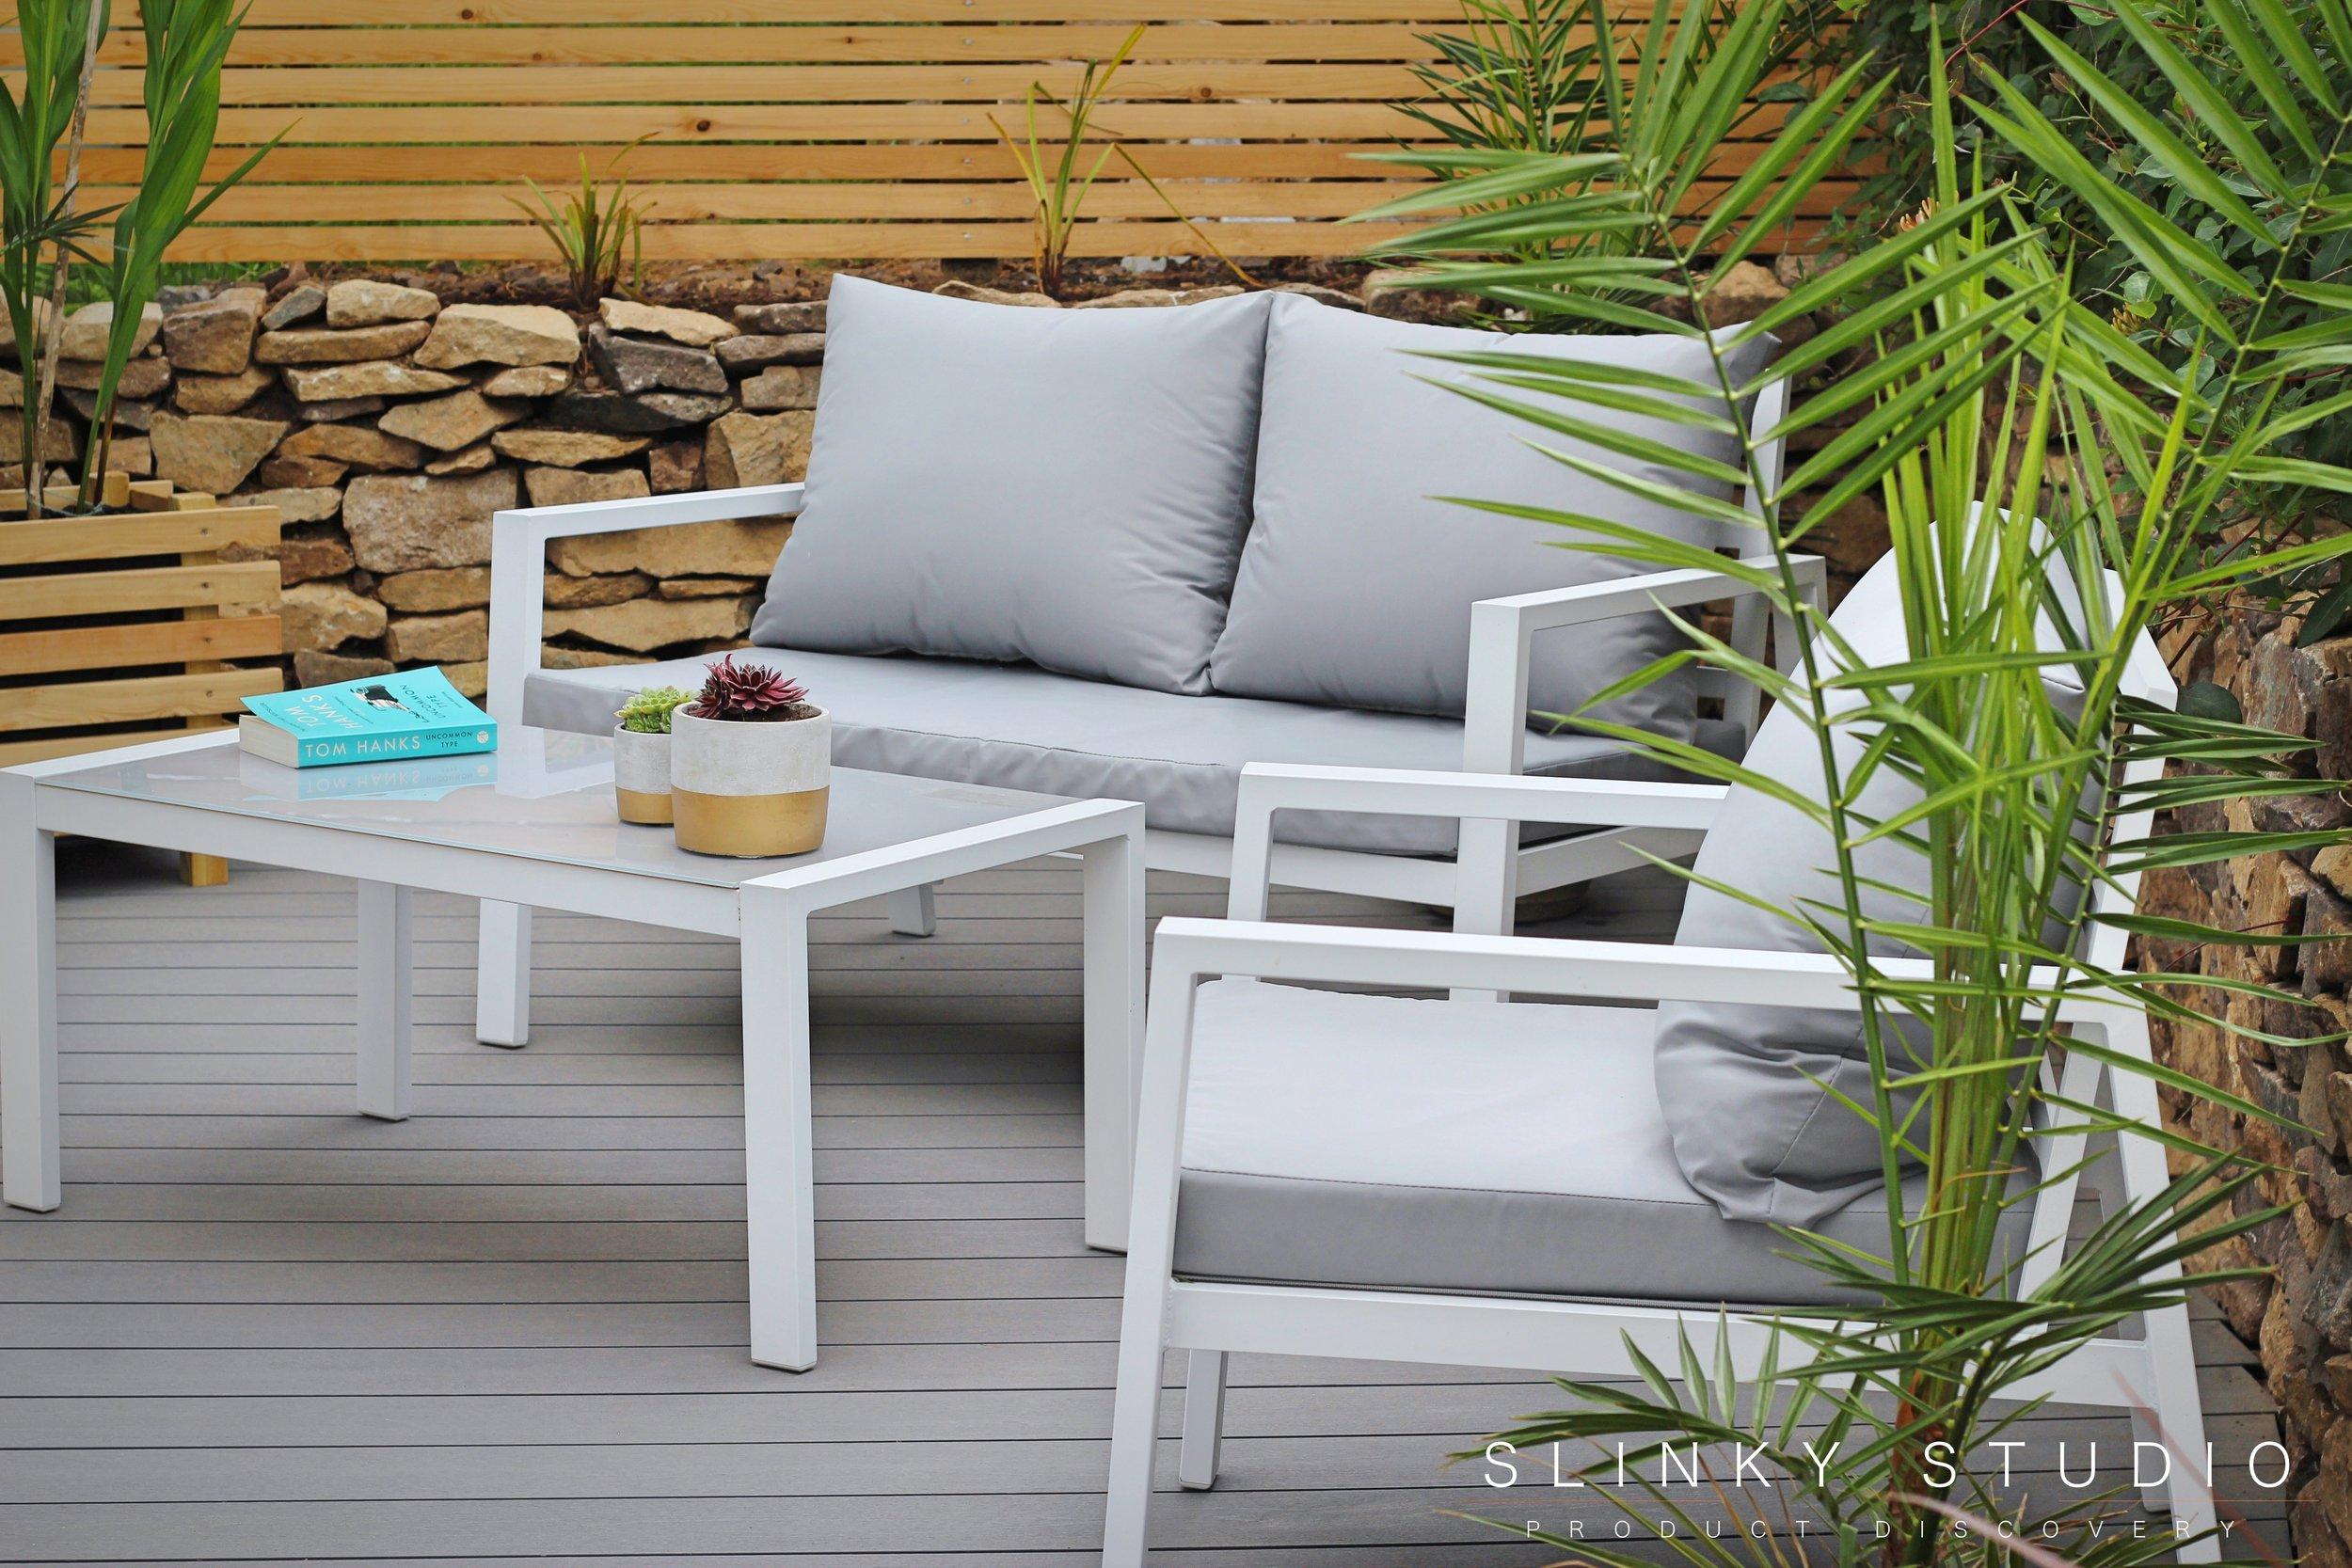 Havwoods Trekker Composite Designer Decking Vulcan Grey Lifestyle Photo Furniture Close Up Aluminium 4 Seater Sofa Set.jpg